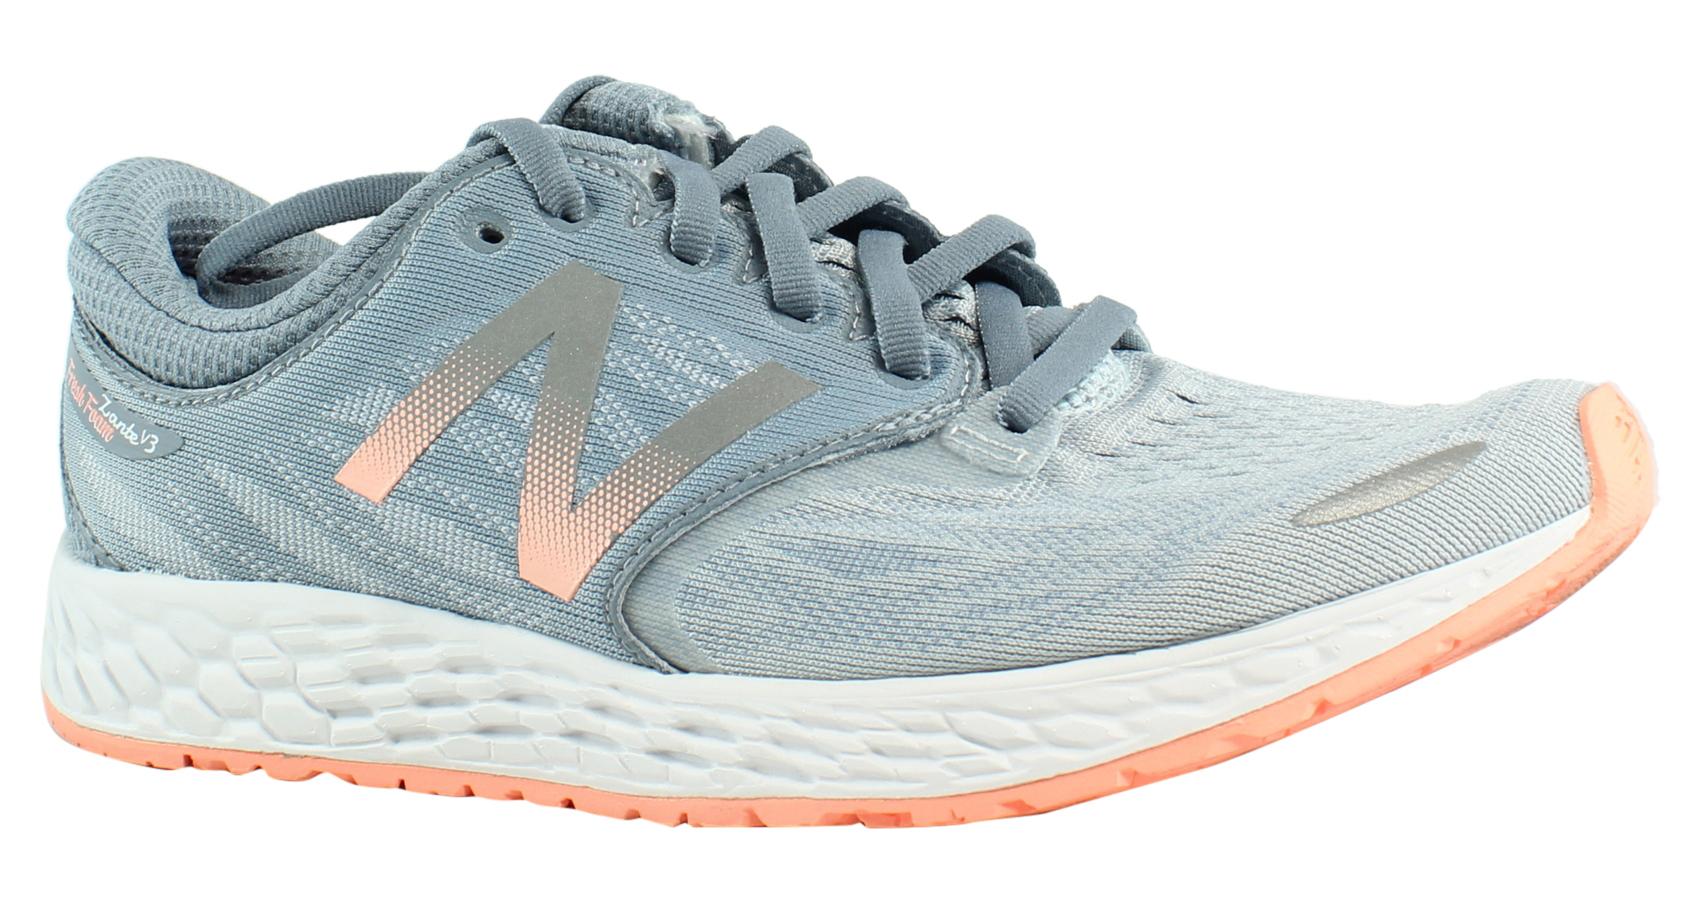 New Balance Damenschuhe Wzantwg3 Reflection/RoseGold (346808) Running Schuhes Größe 8 (346808) Reflection/RoseGold 62519c